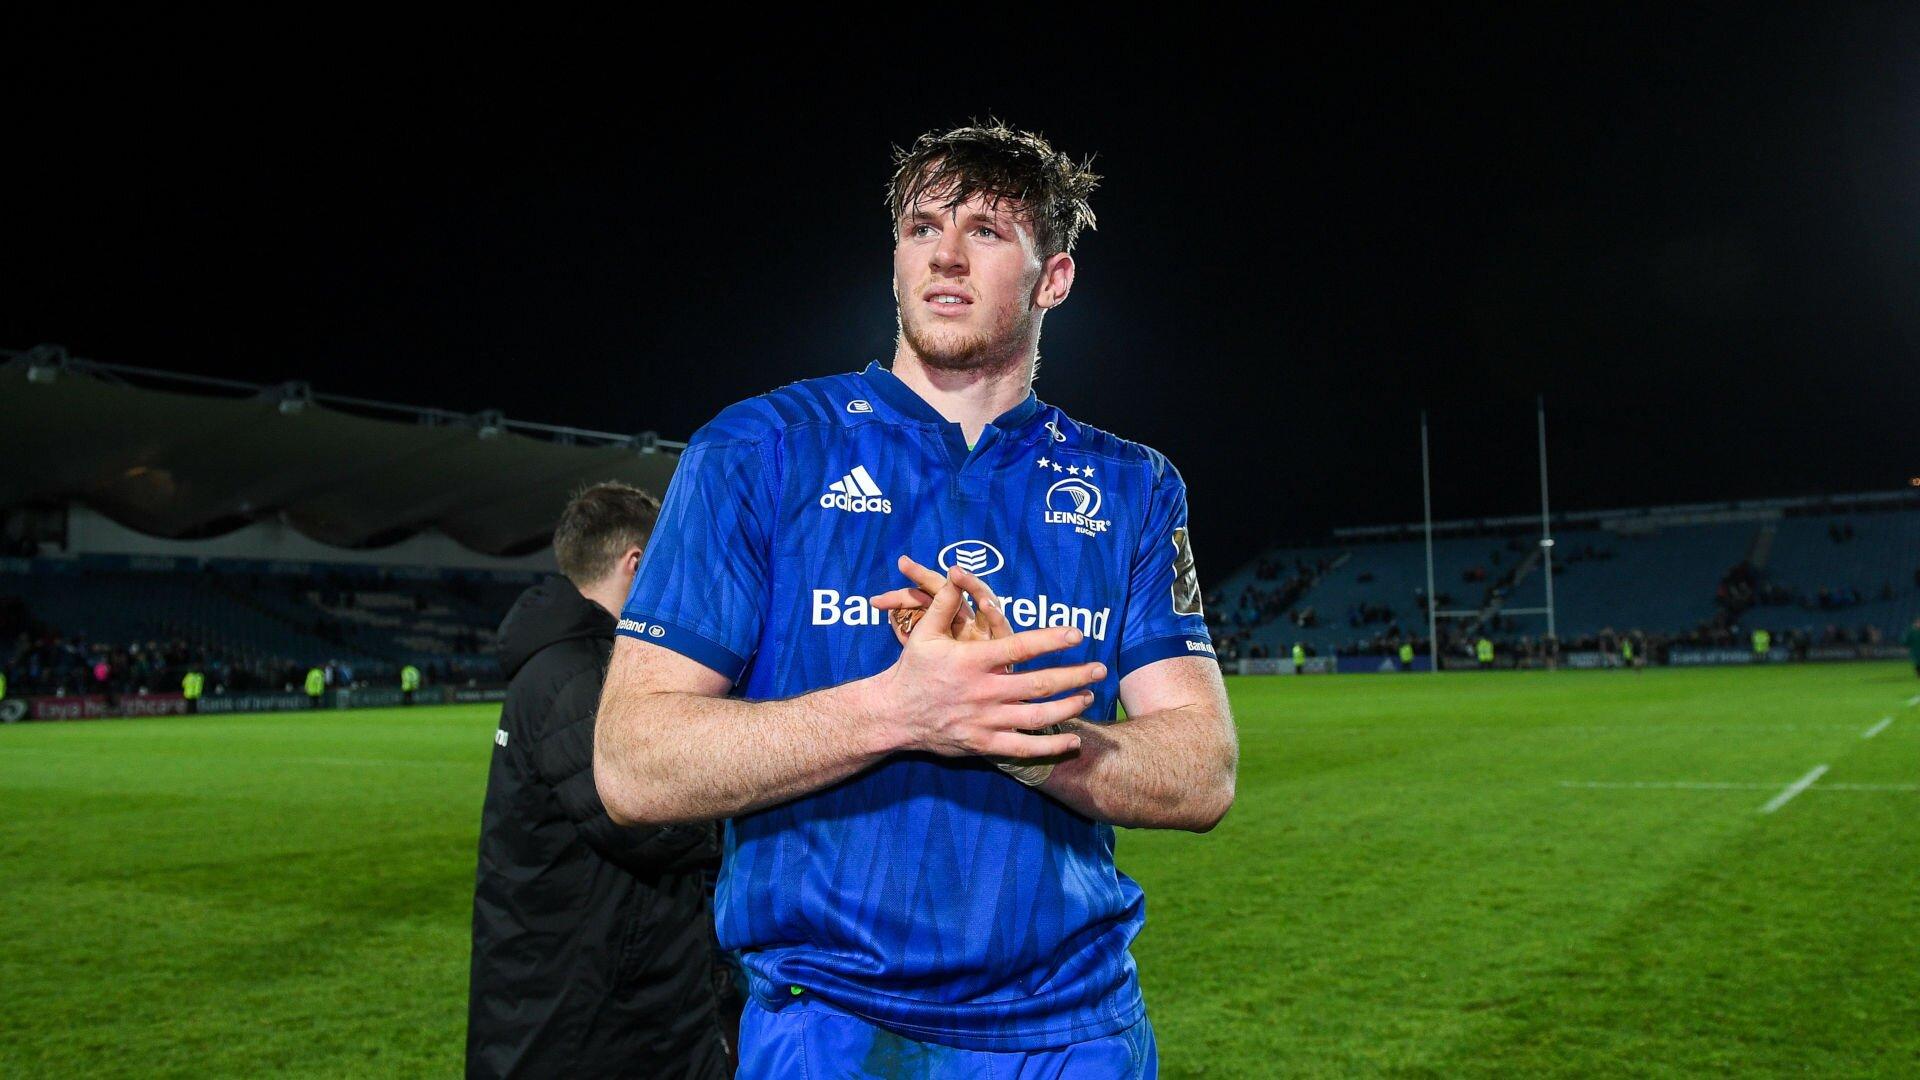 Leinster Ryan Baird